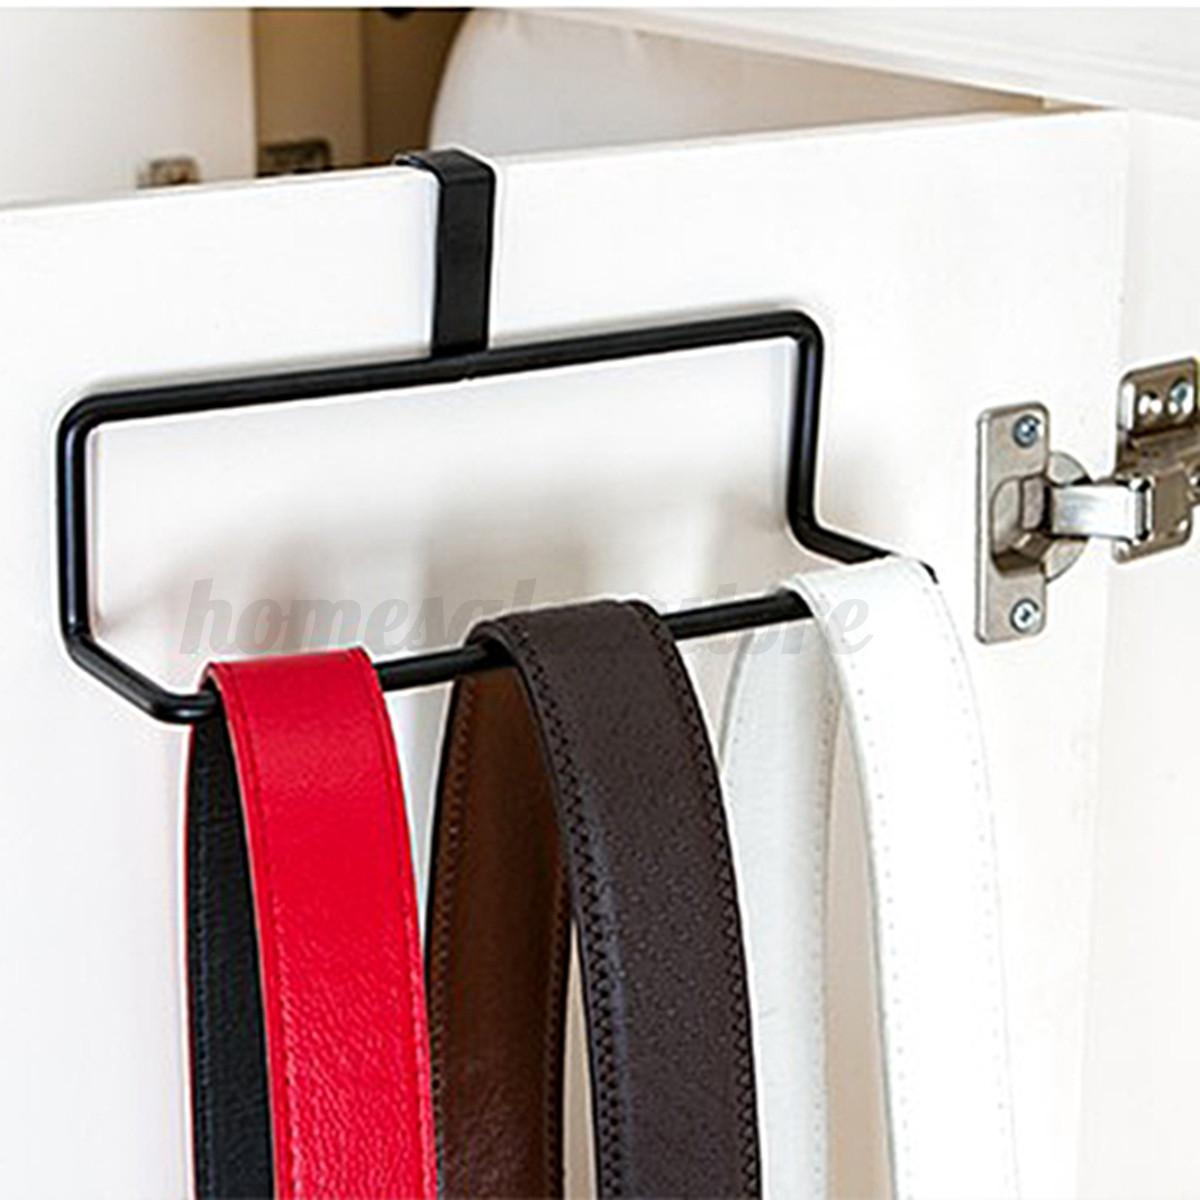 19cm Cabinet Hanger Over Door Kitchen Drawer Towel Holder Hook Storage Bathroom Ebay